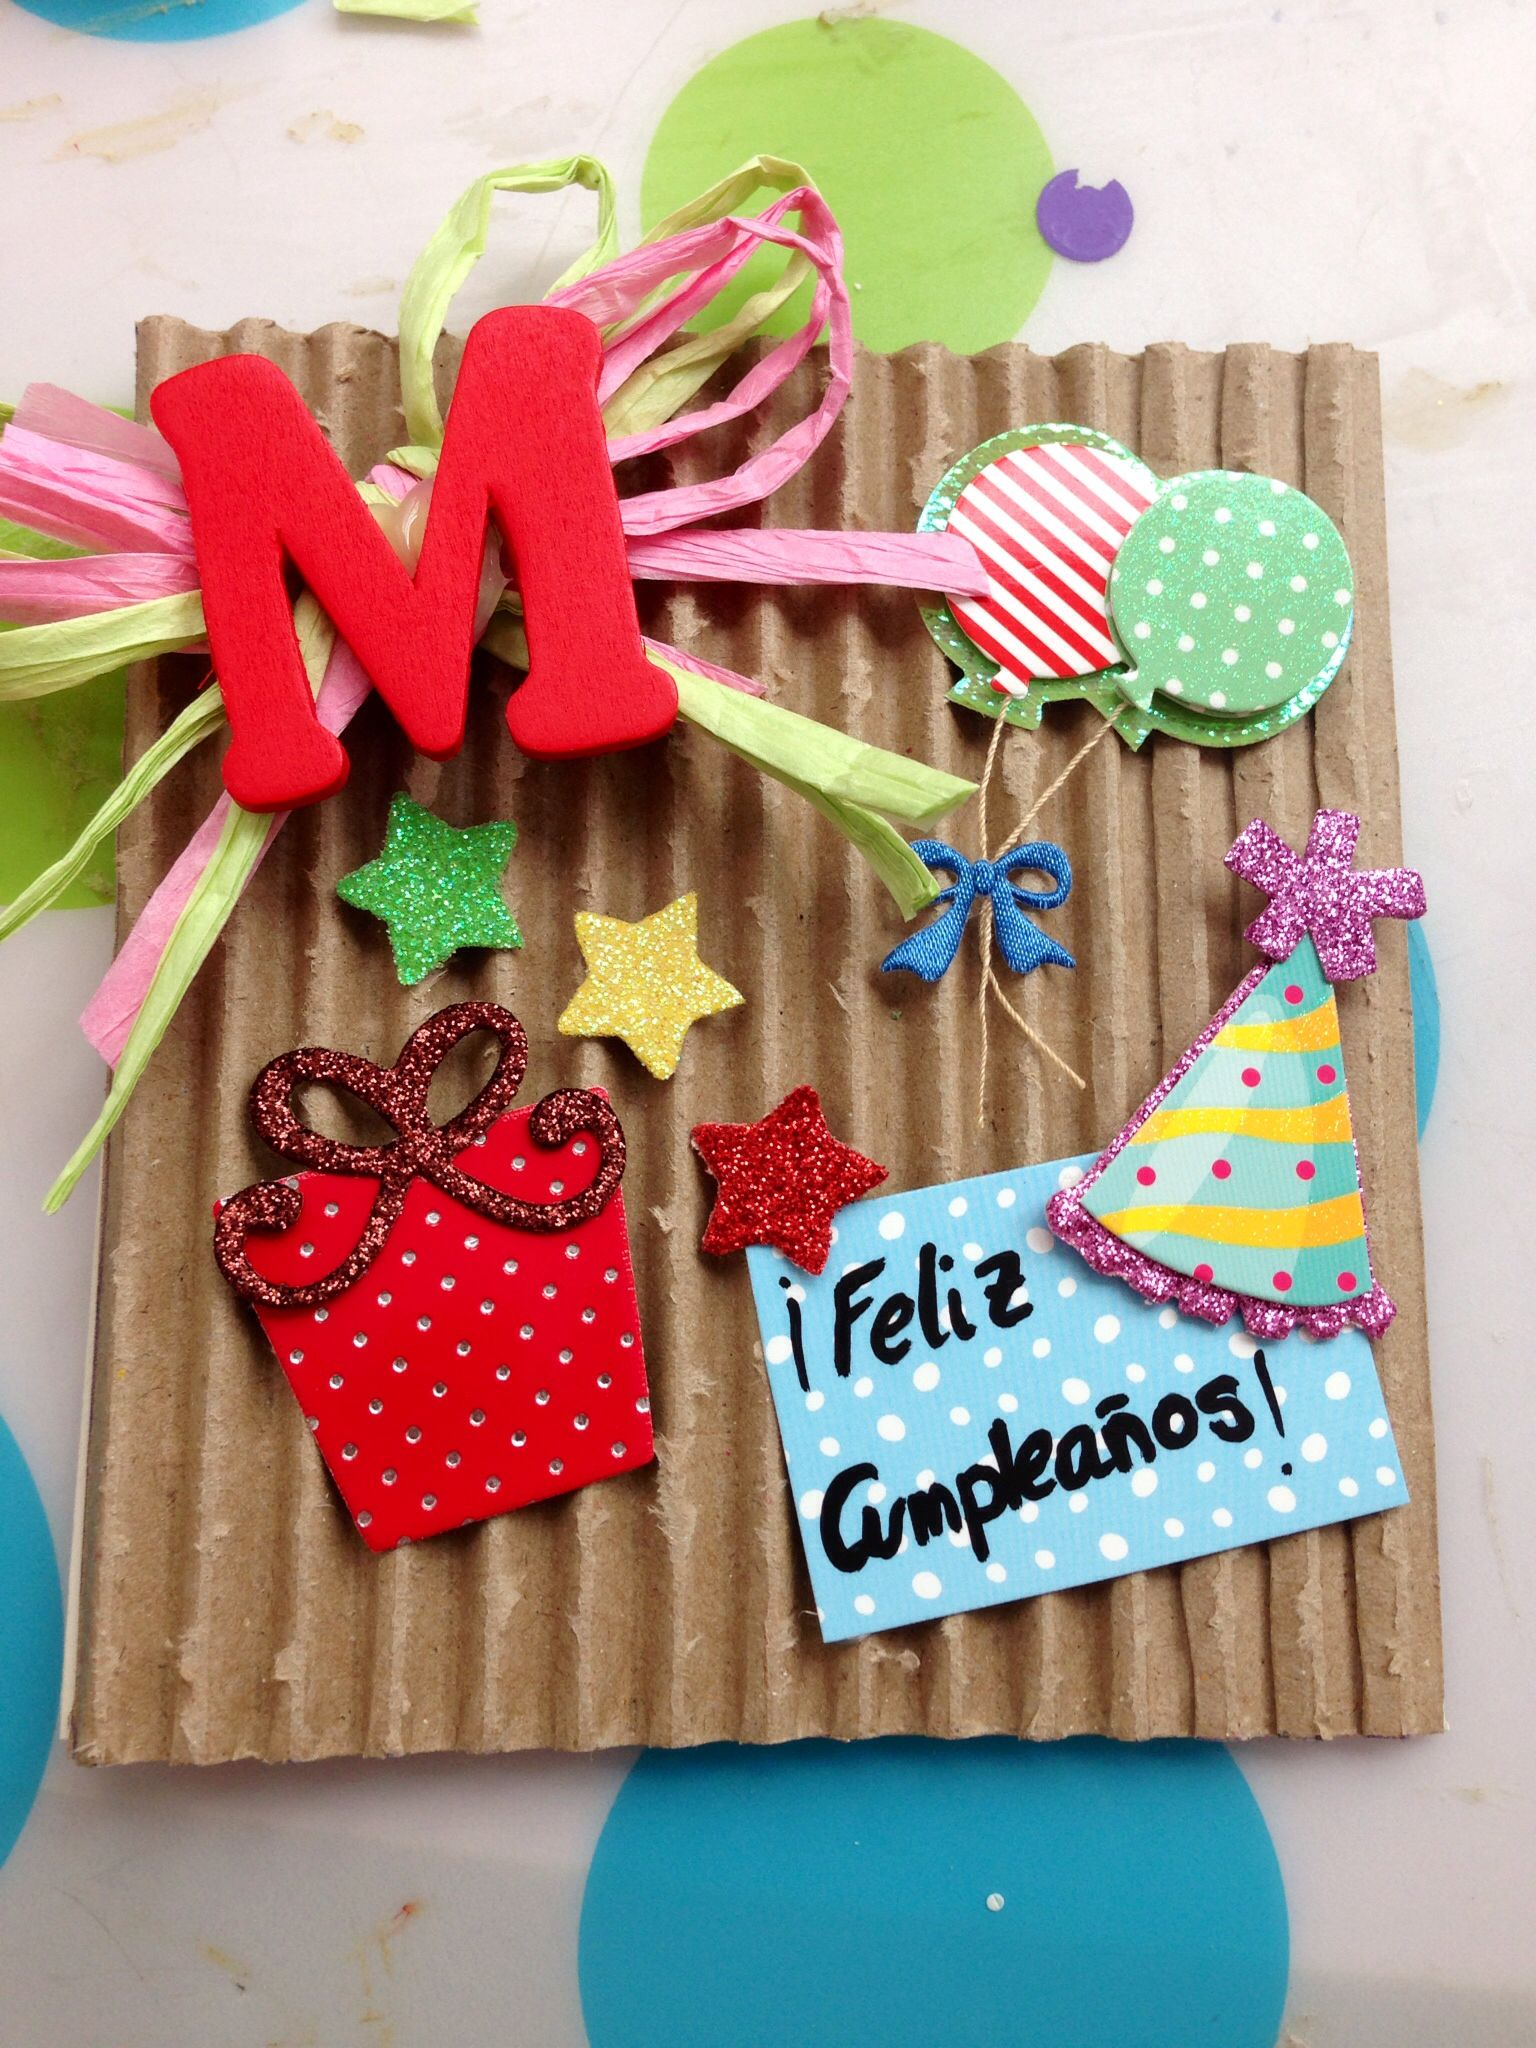 Una tarjeta de cumpleaños para mi amiga Melisa Manualidades Pinterest Ideas, Birthdays and